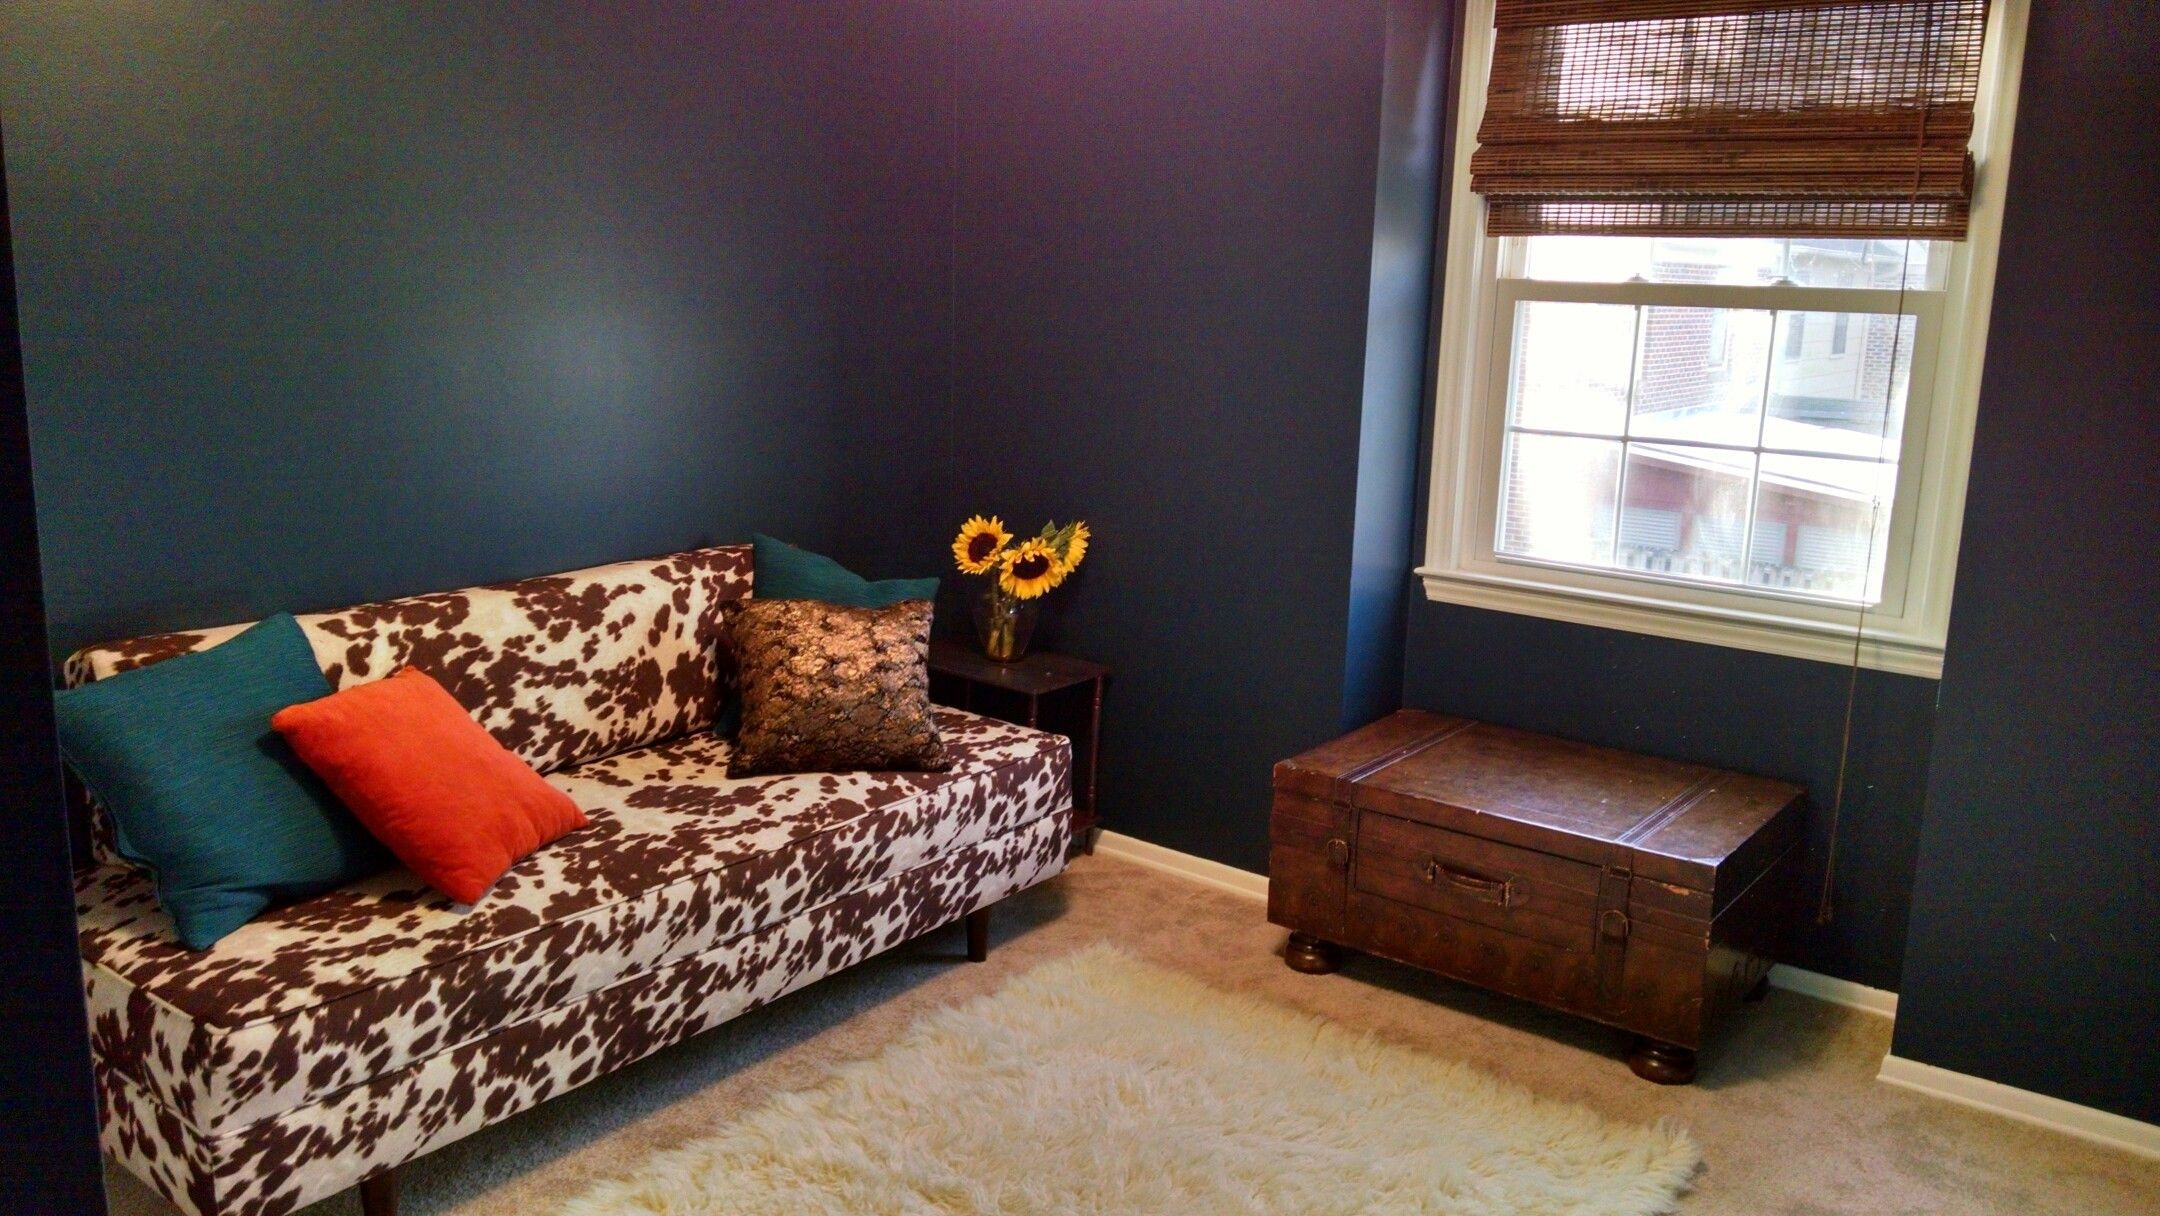 BM gentleman's gray   Home decor, Decor, Storage bench